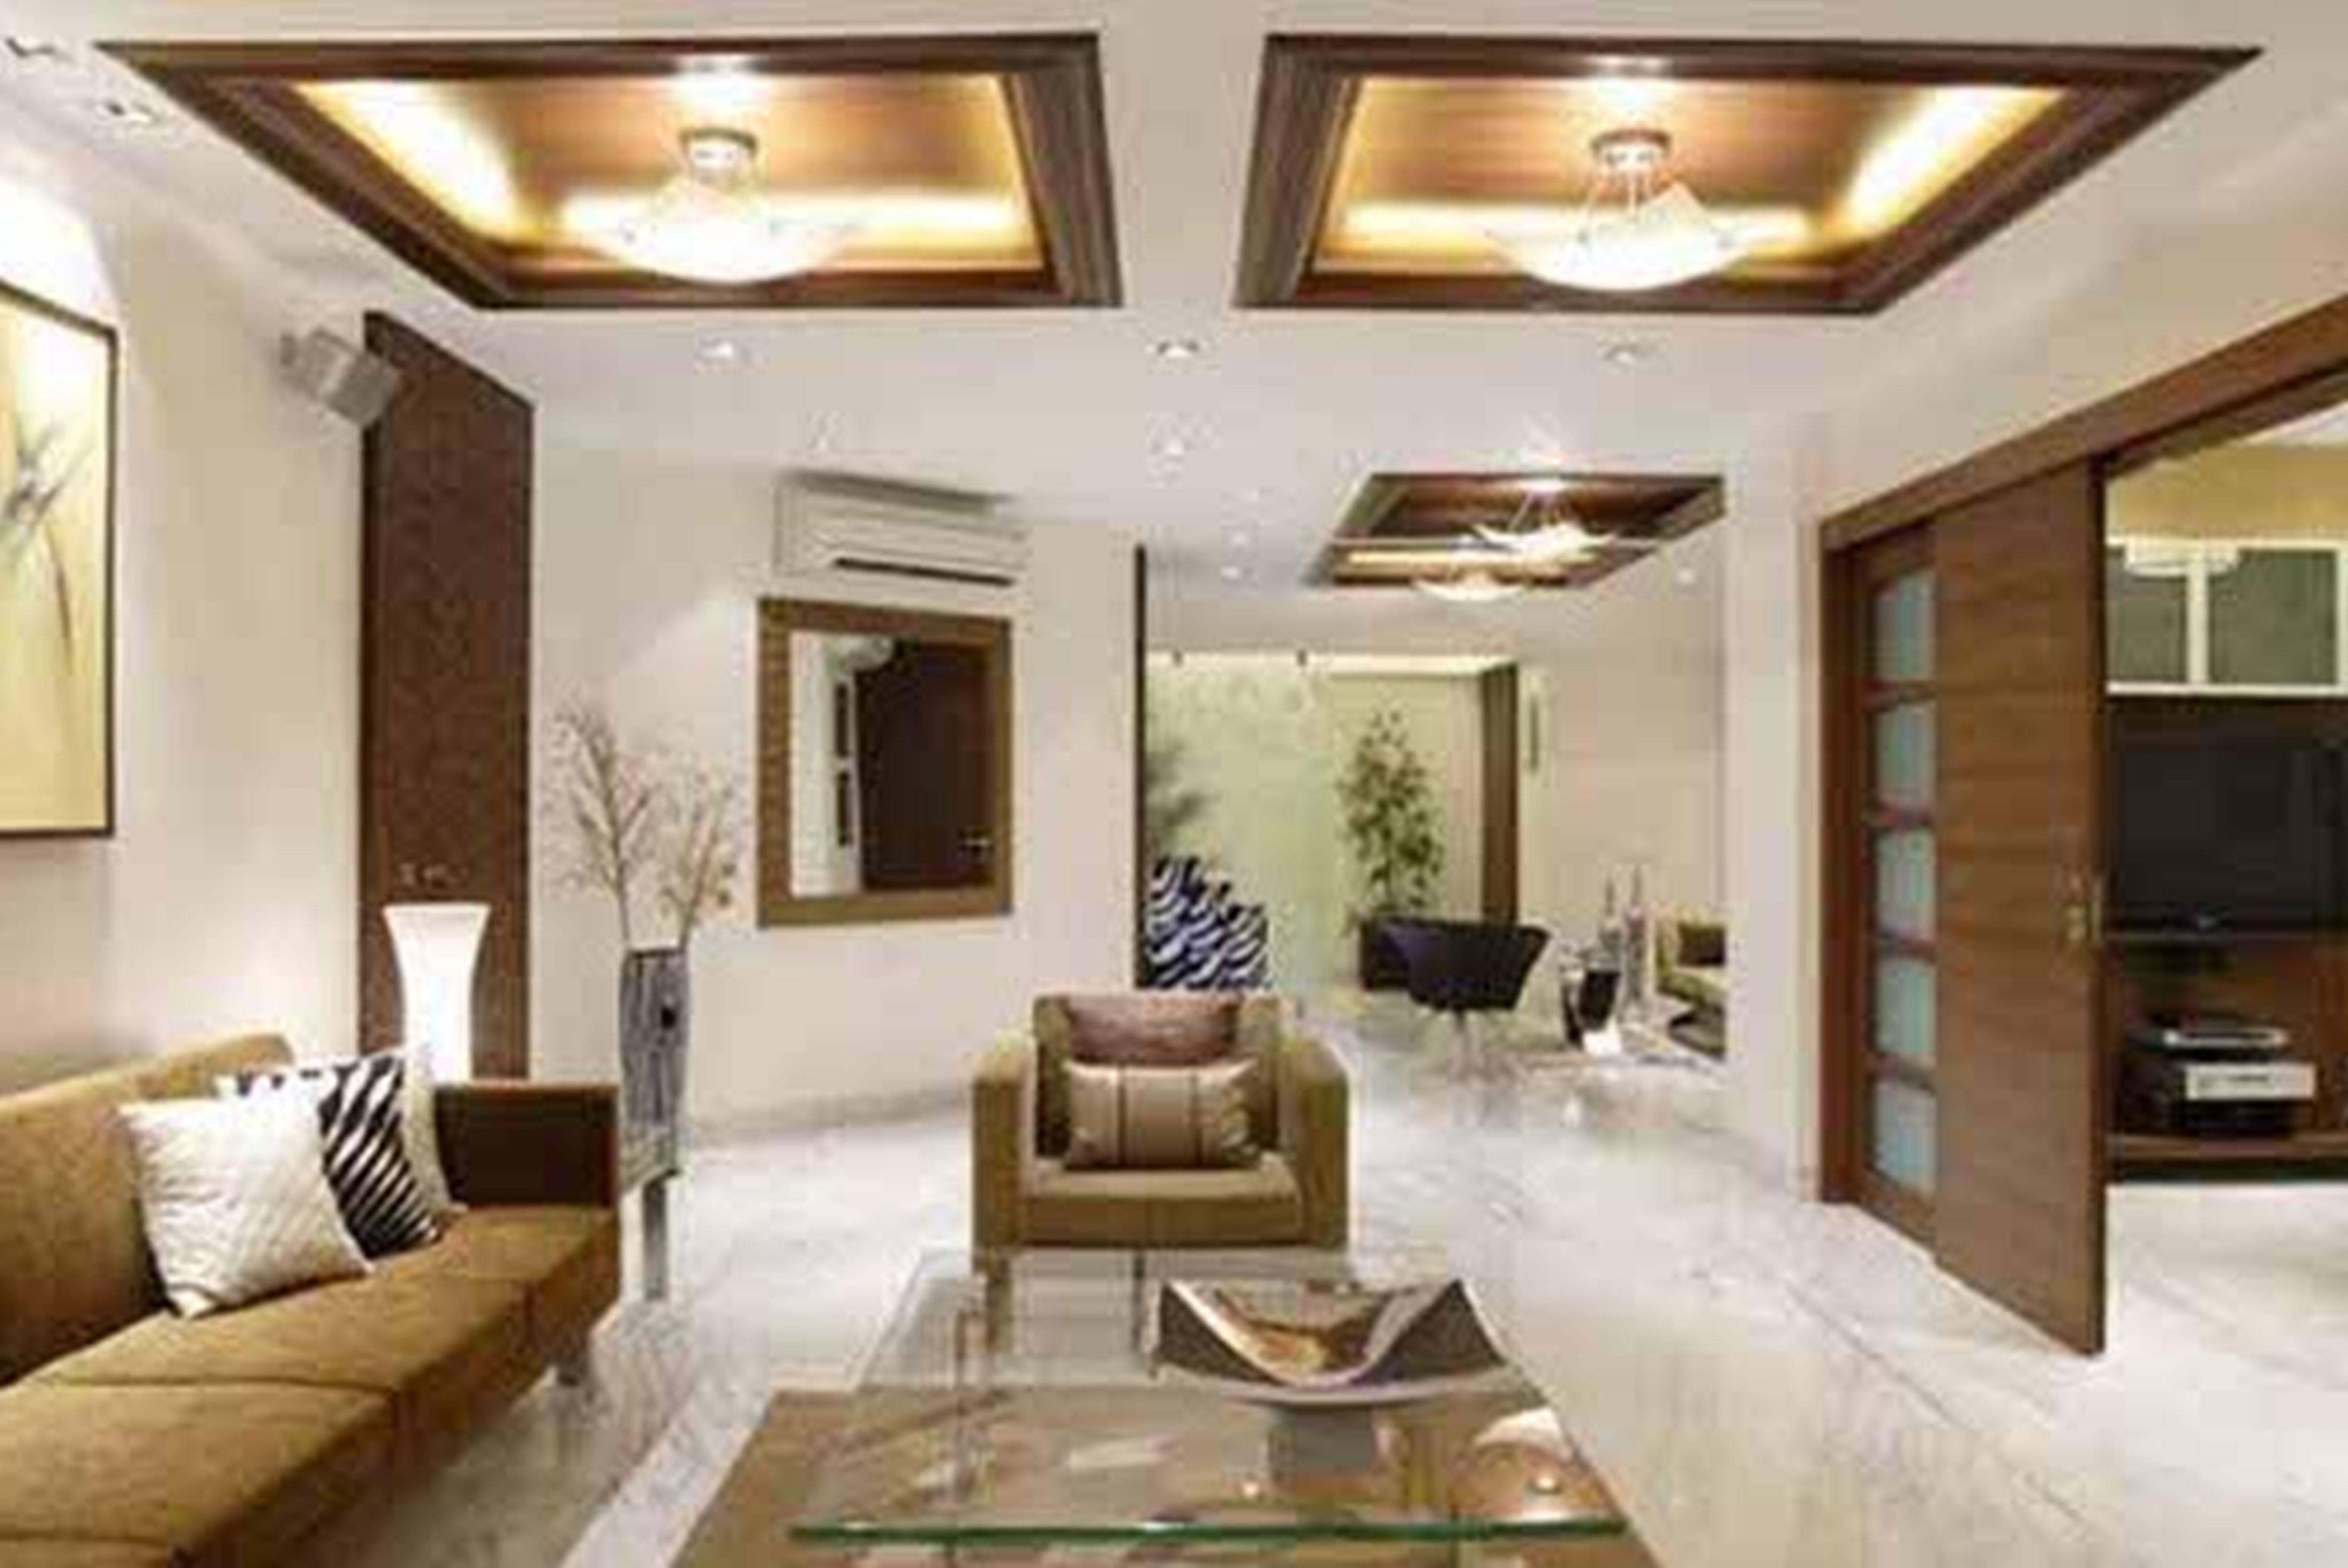 Pin on interior design ideas